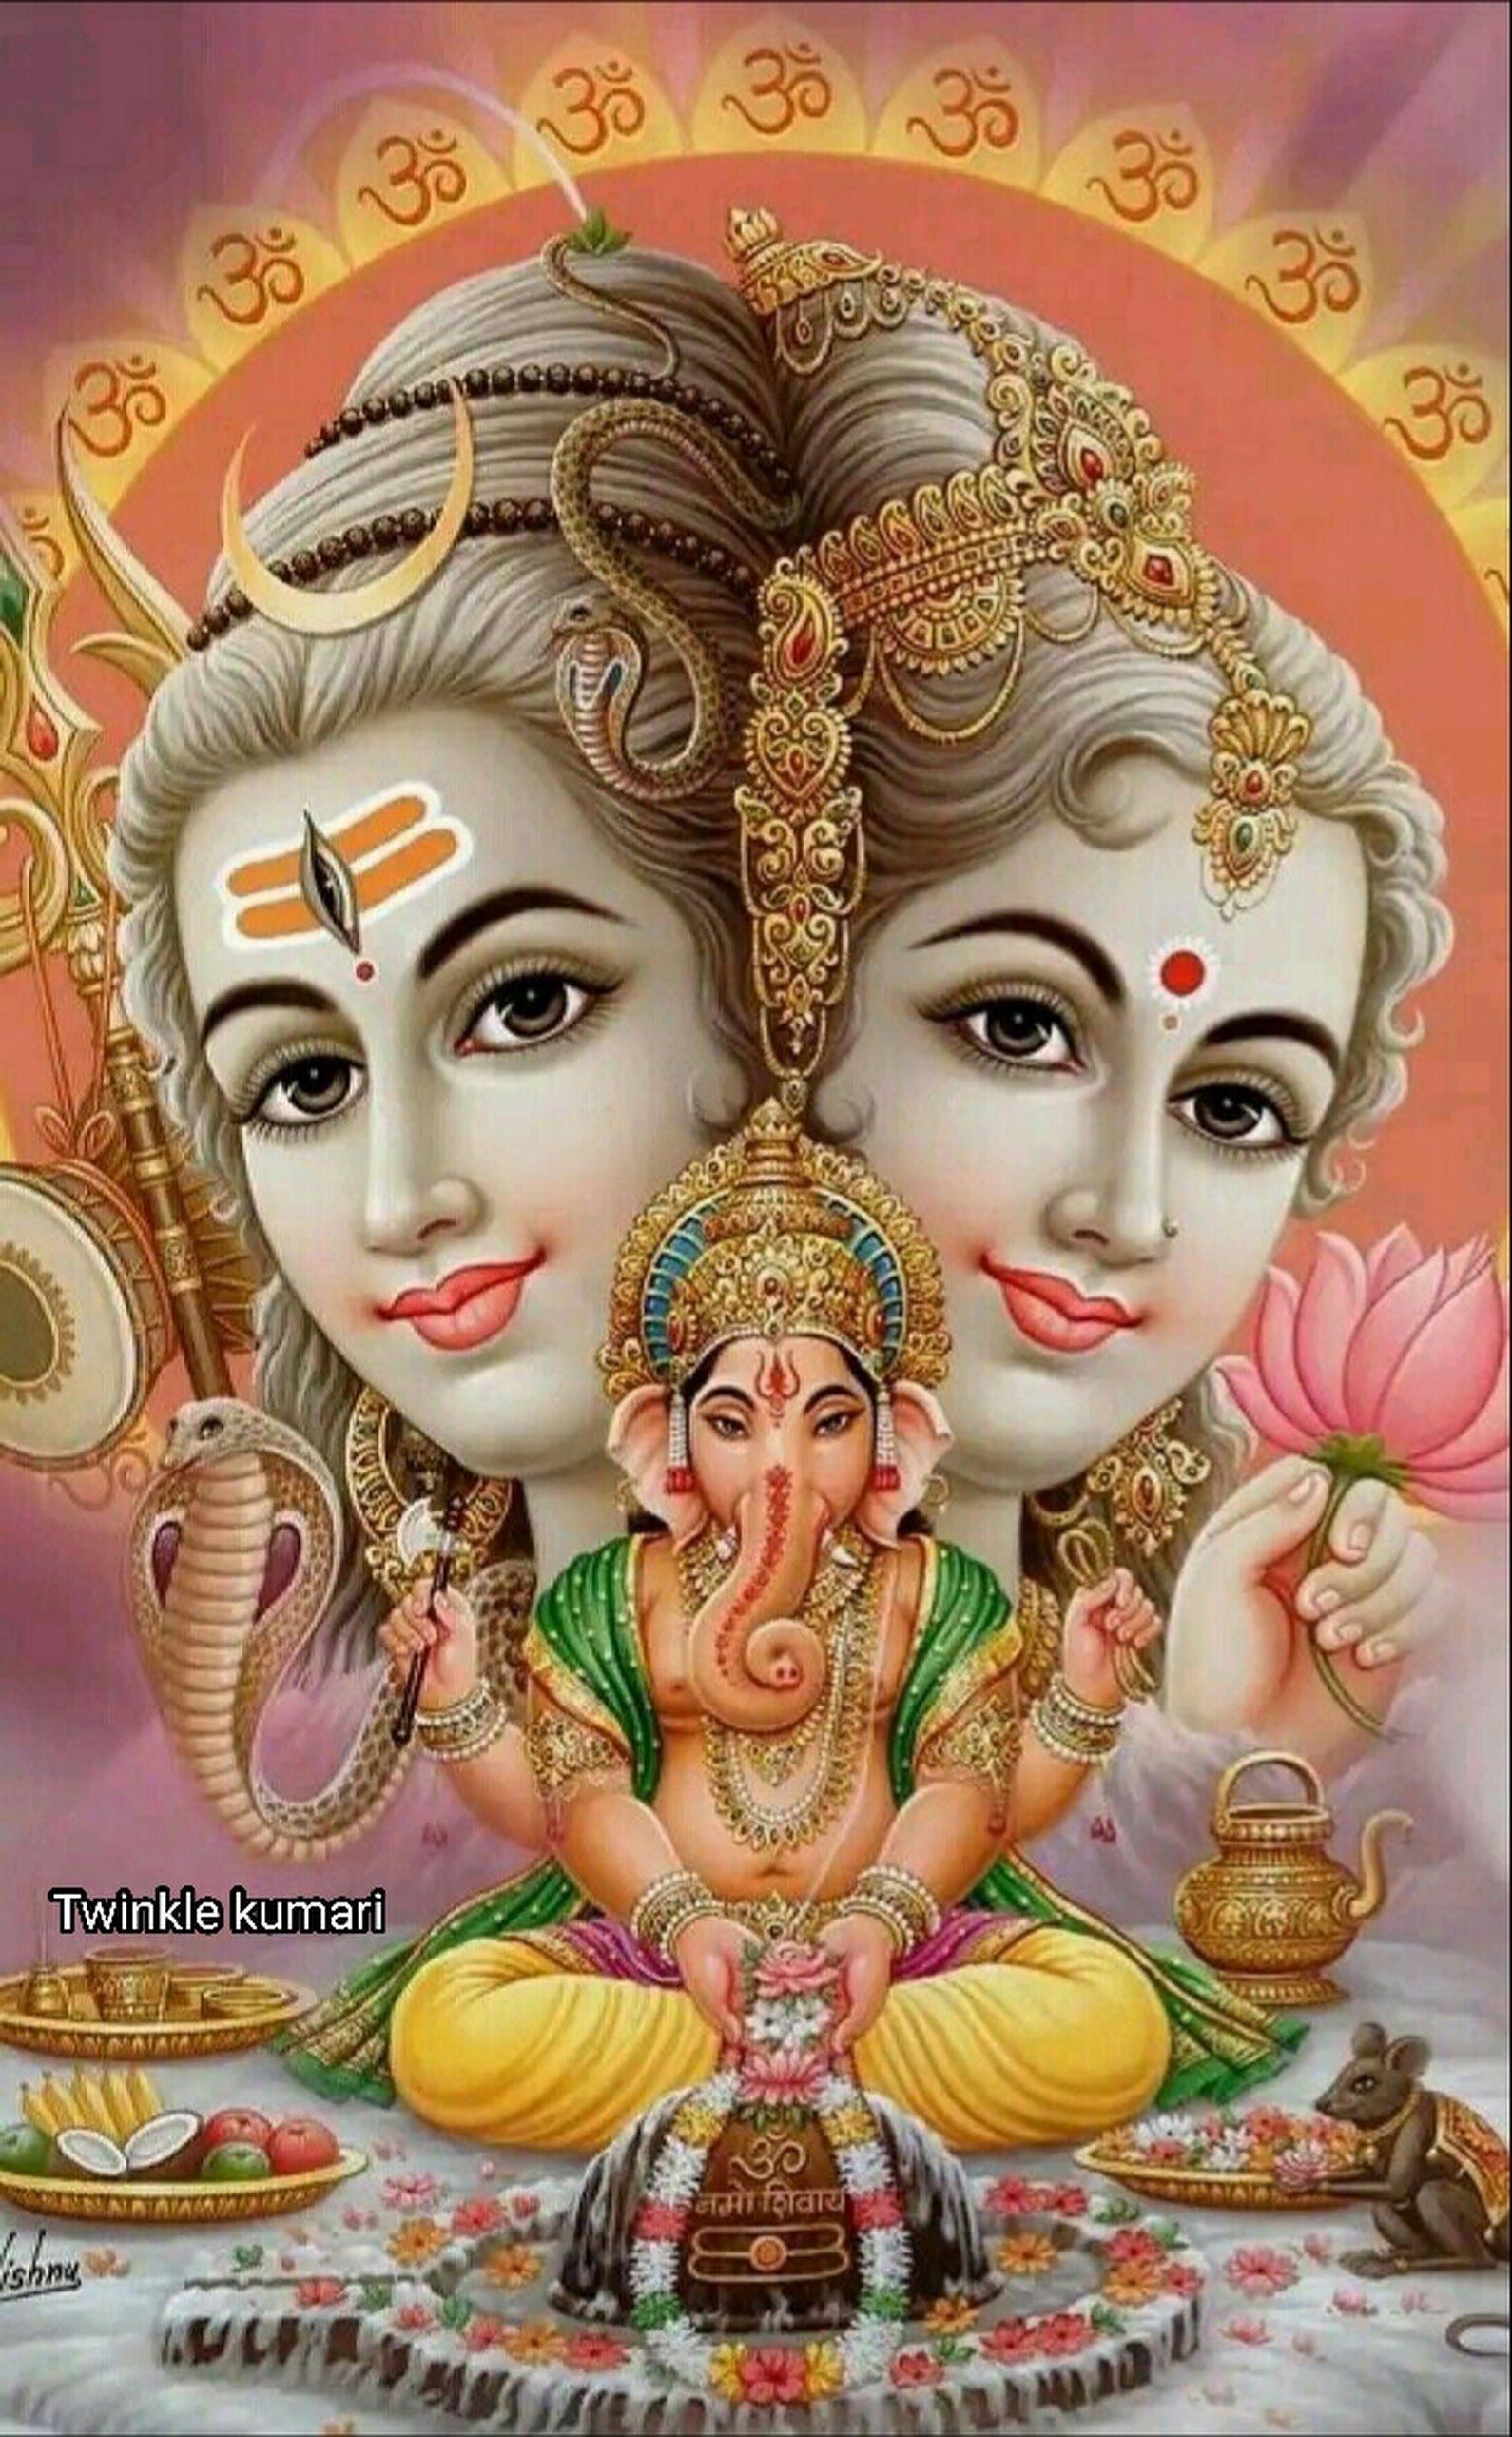 Indian Gods Hindu Gods Collage Shirdi Sai Baba Saibaba Wallpaper